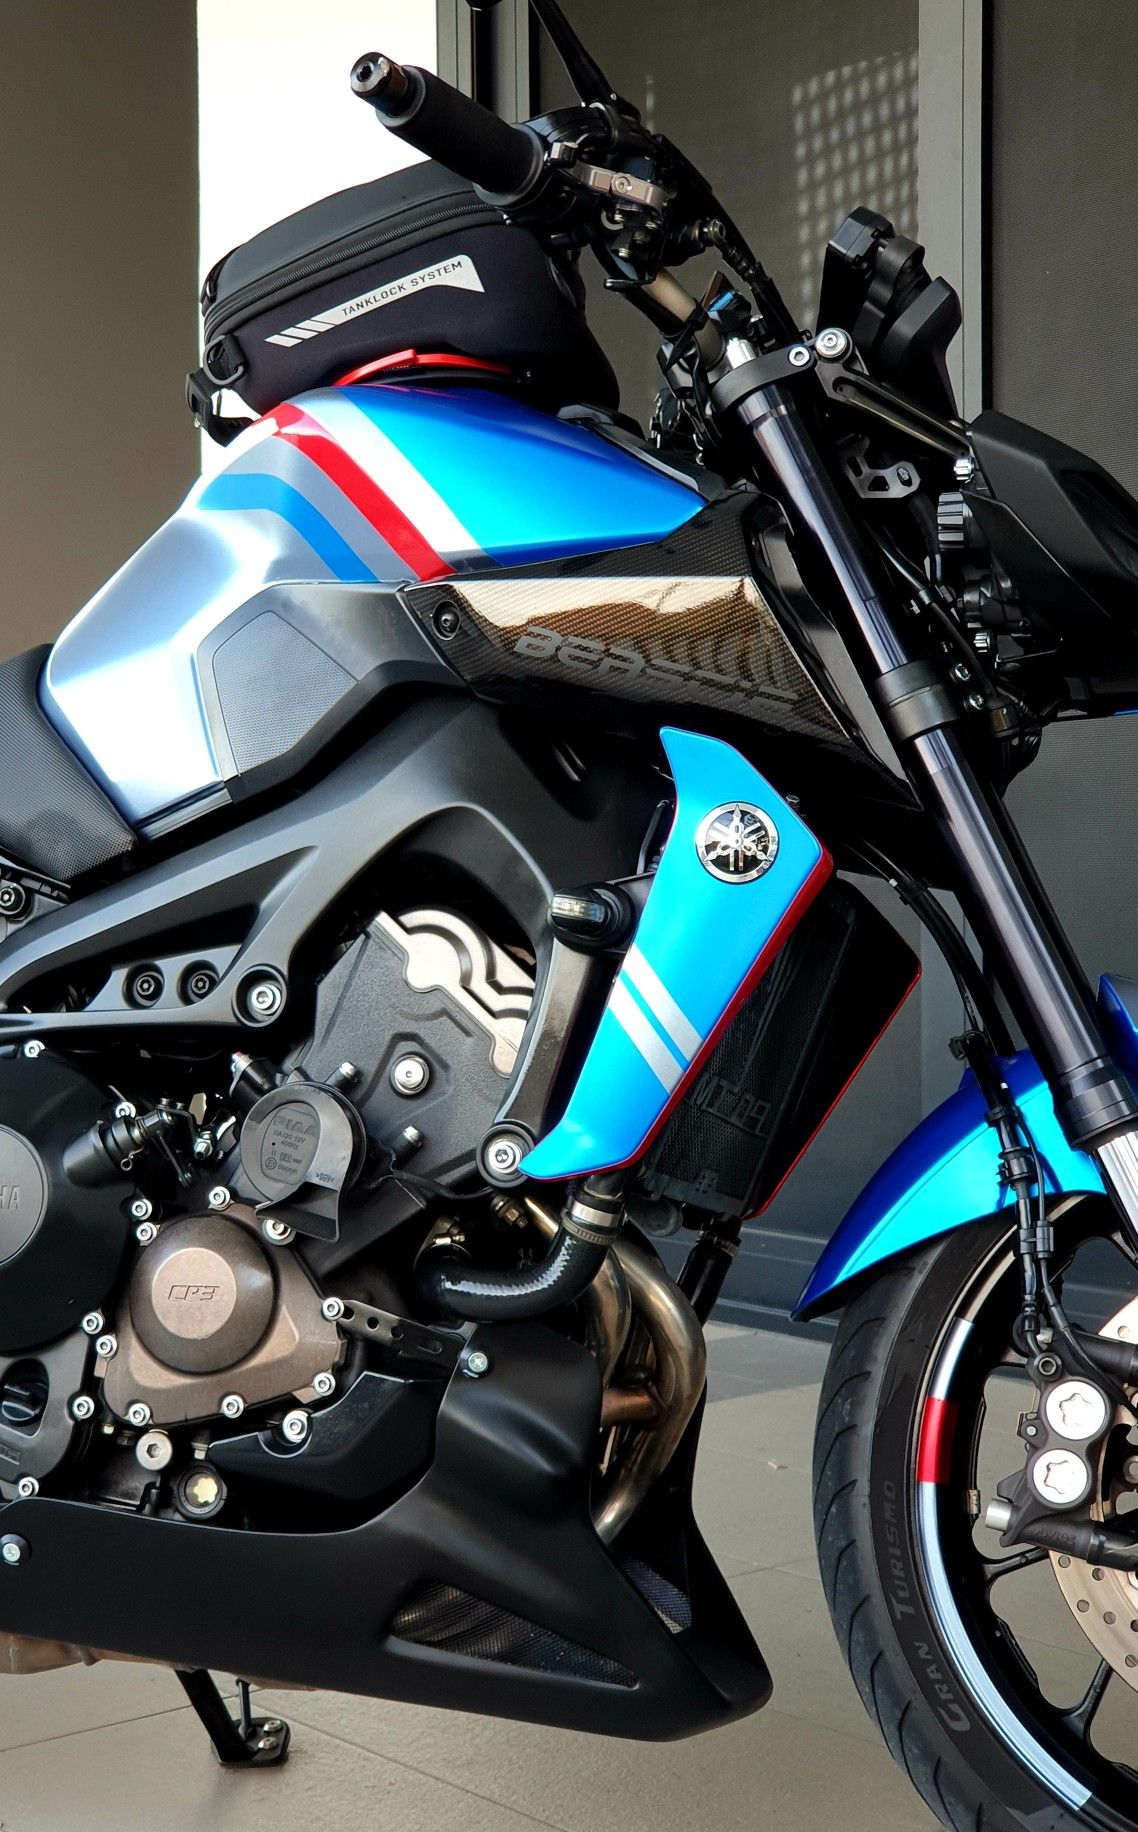 Yamaha MT-09 4K Wallpaper, Naked bikes, 2021, 5K, Bikes, #3096